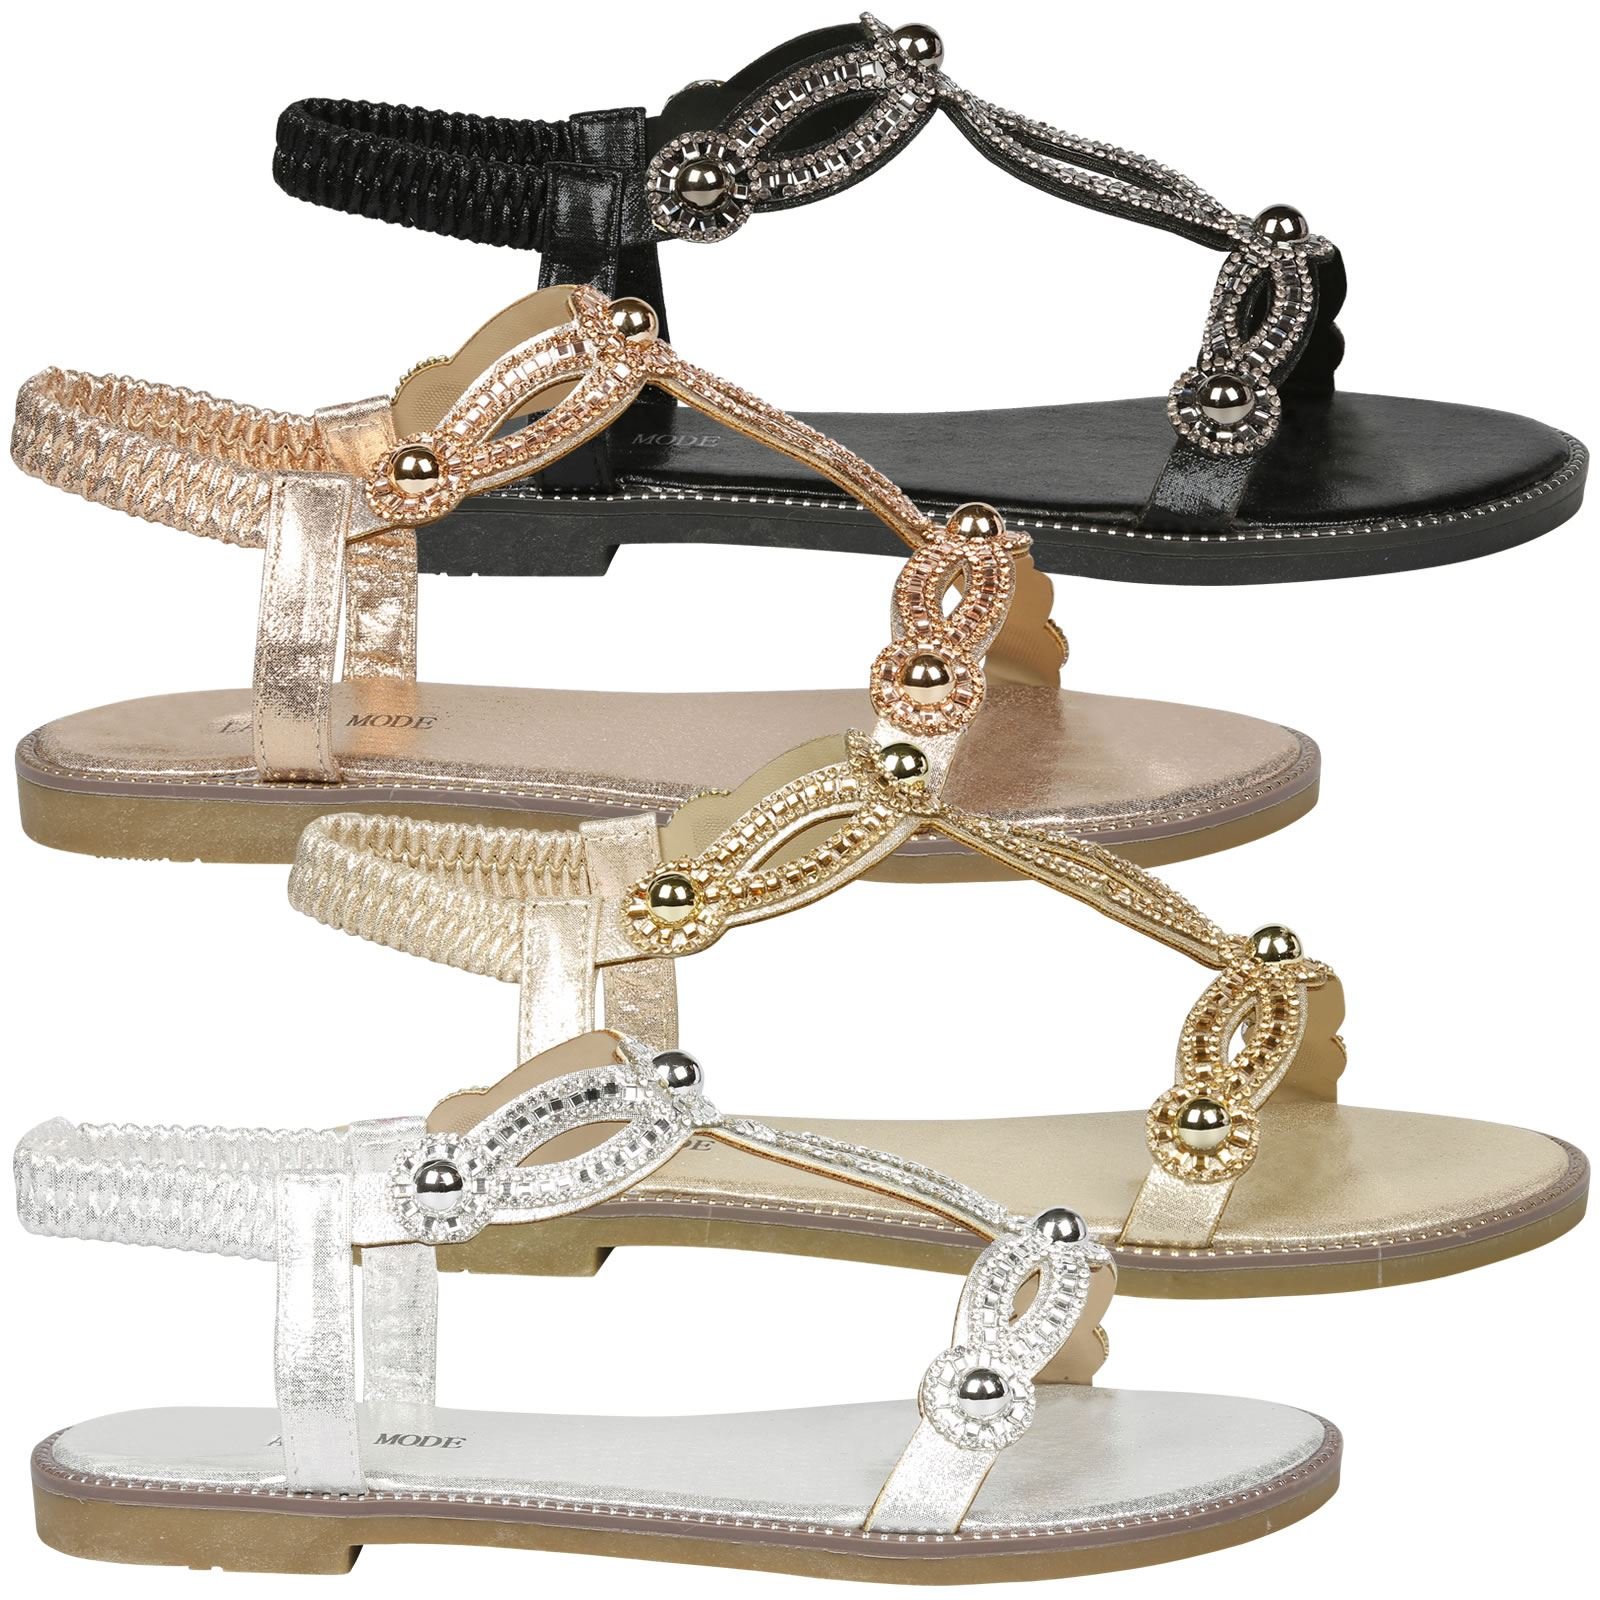 a09b38bae3d Details about Elle Womens Flats Peep Toe Diamante Studded Sandals Ladies  Summer Shoes Size New